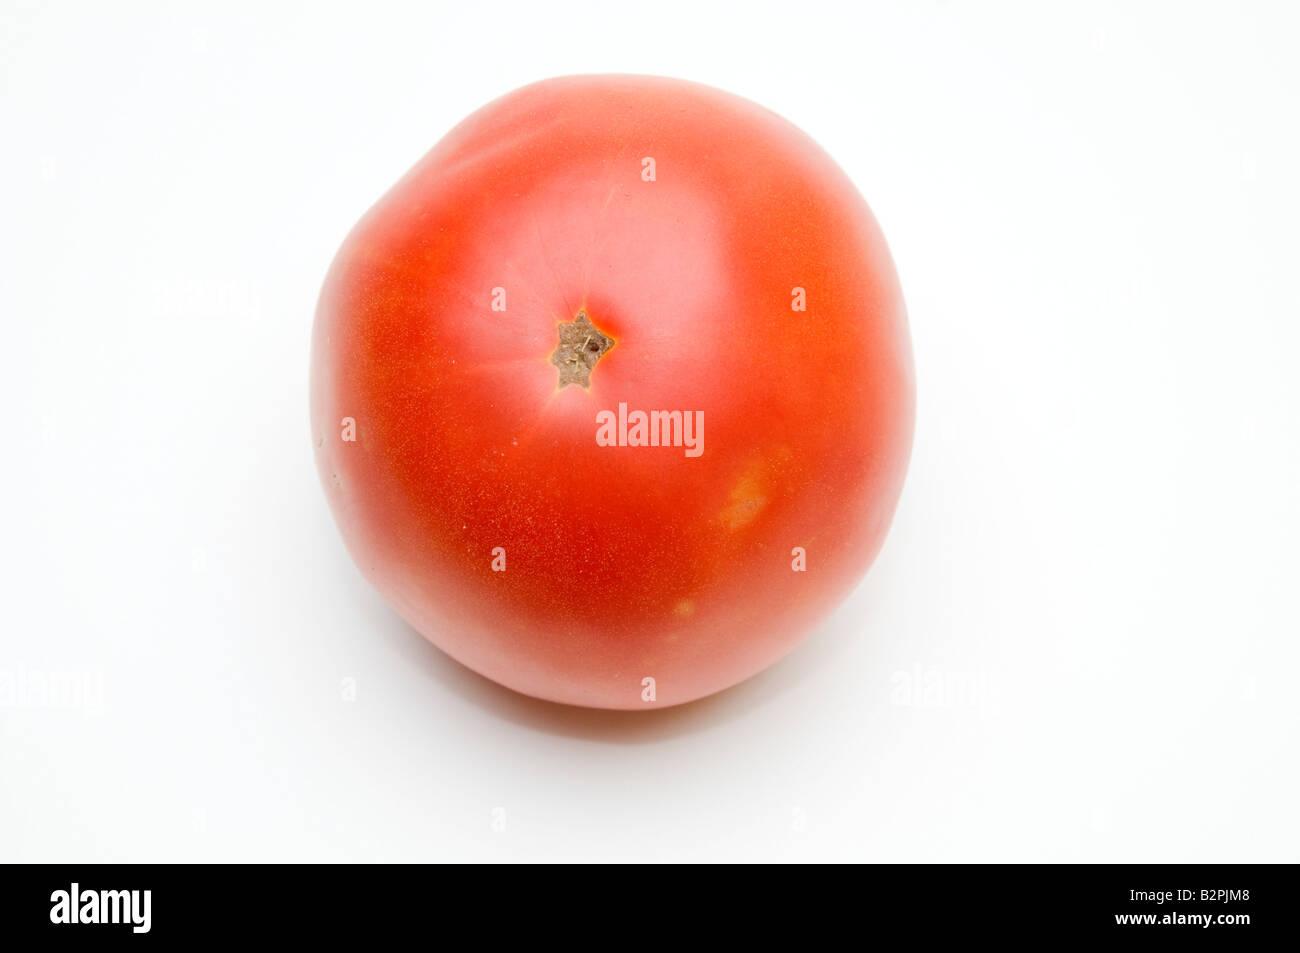 fresh ripe Red tomato on white background - Stock Image